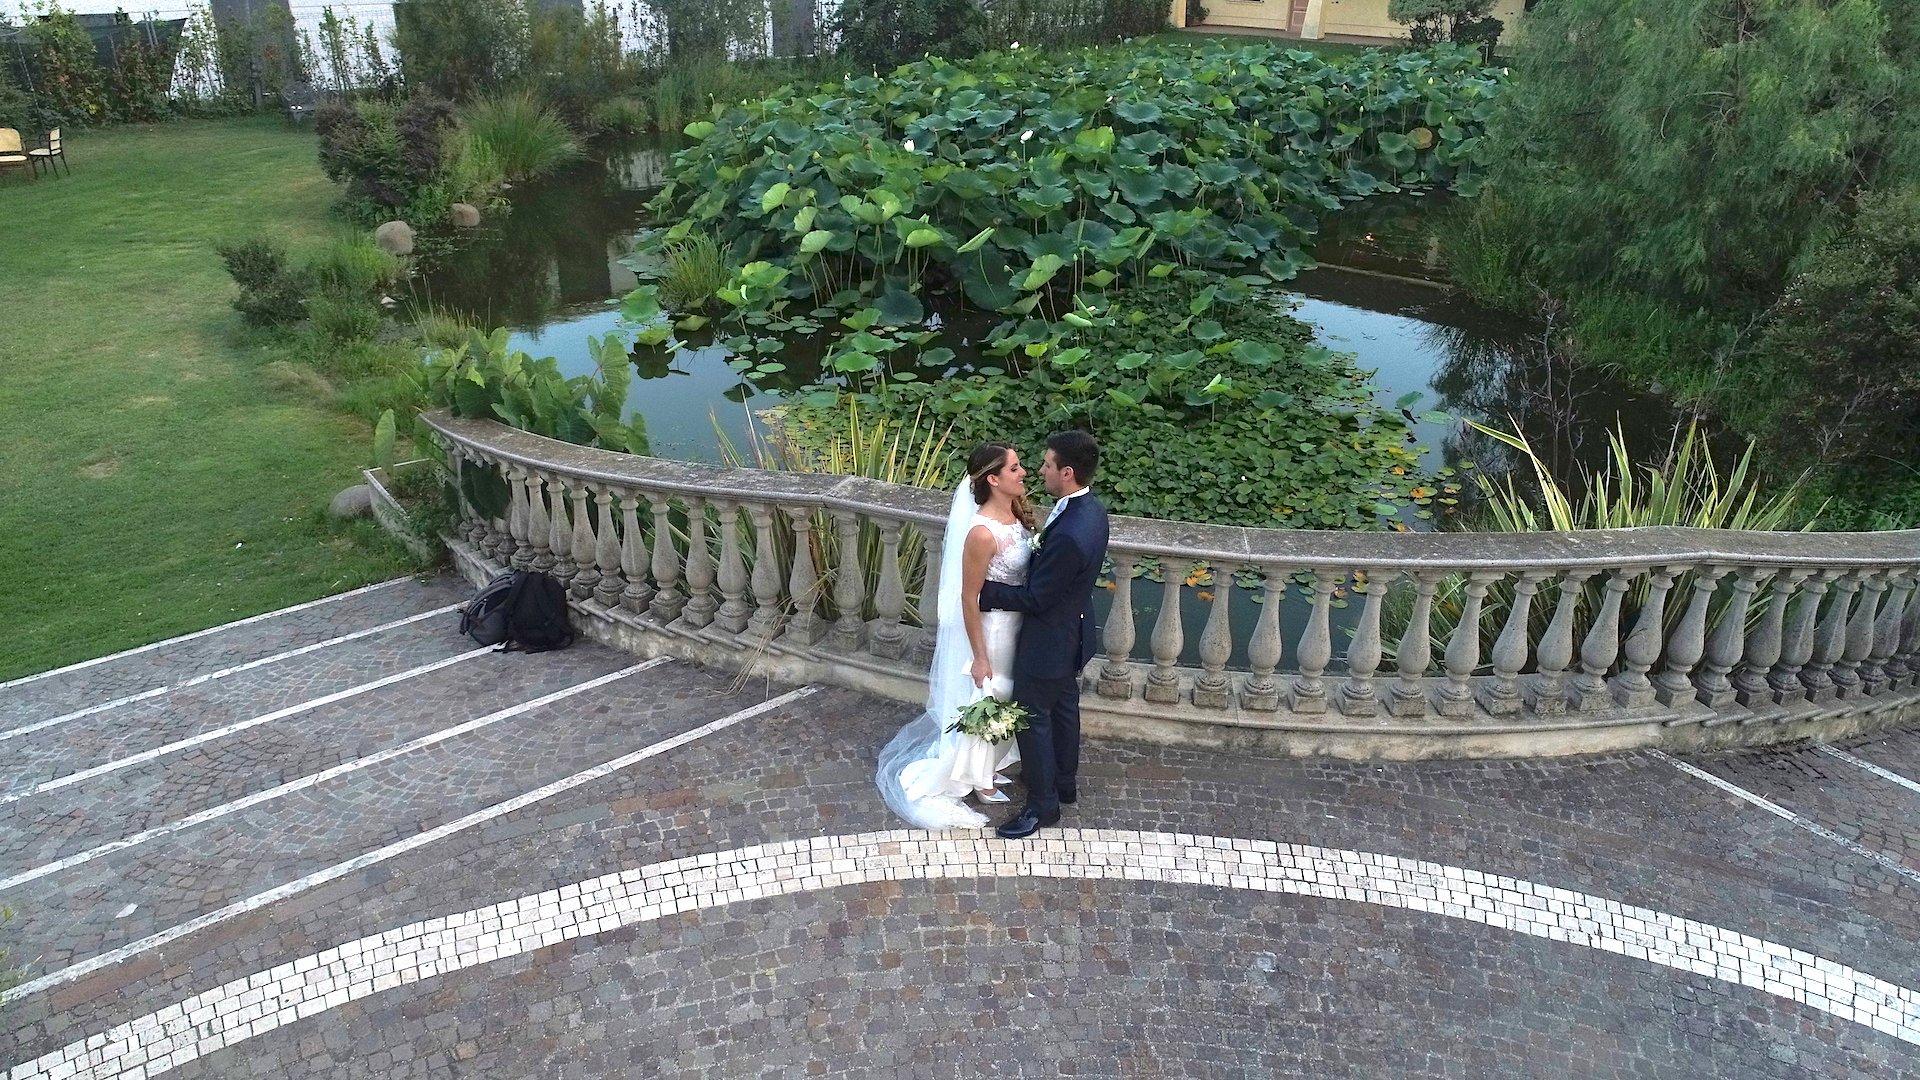 riprese droni roma matrimonio romantico